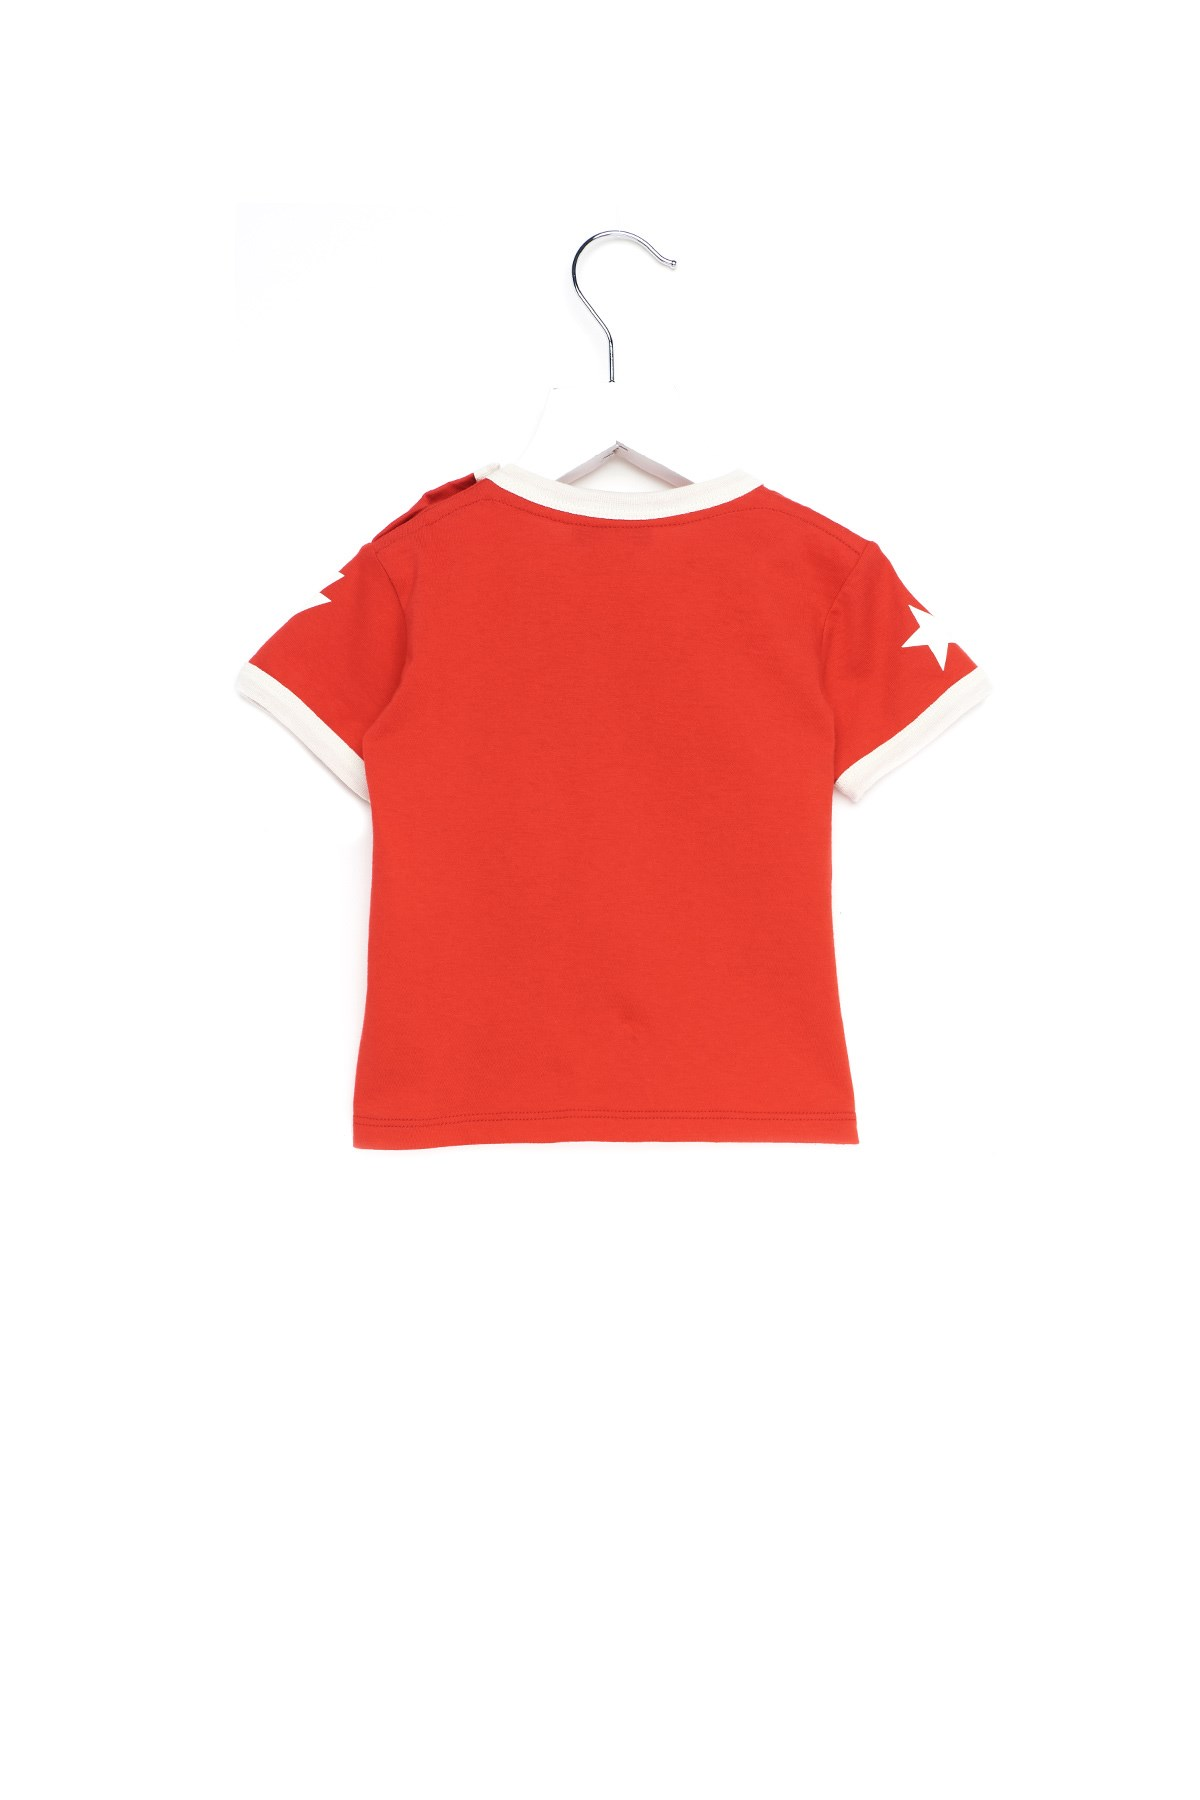 f24e7d73547 gucci  tiger print  t-shirt available on julian-fashion.com - 59255